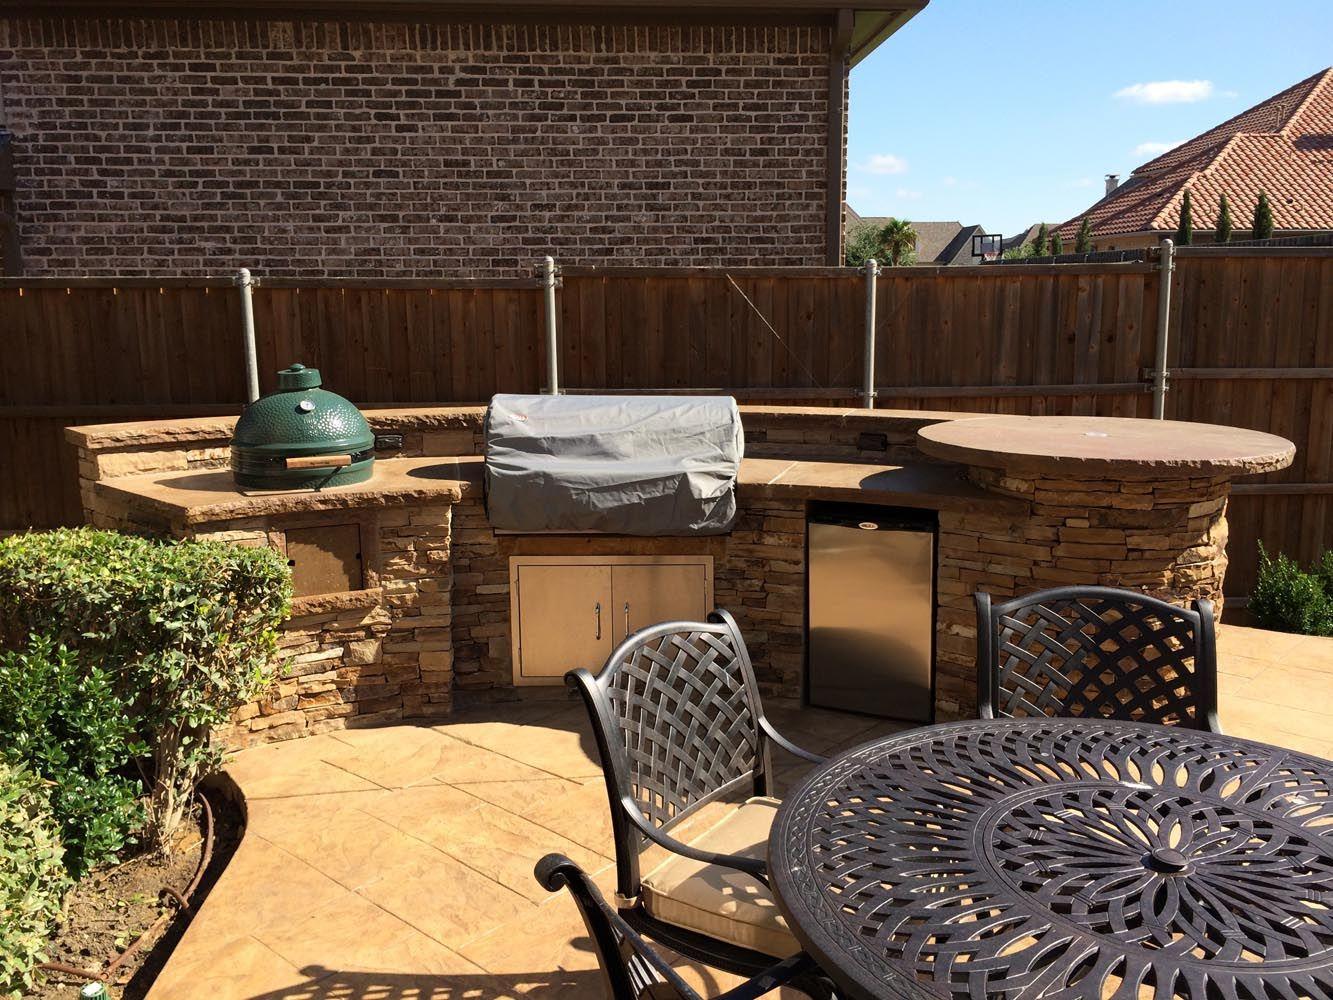 Artesian Custom Pools 9191 Kyser Way 200 Frisco Tx 75033 214 578 3395 Www Artesiancustompools Com Outdoor Living Outdoor Furniture Sets Outdoor Kitchen